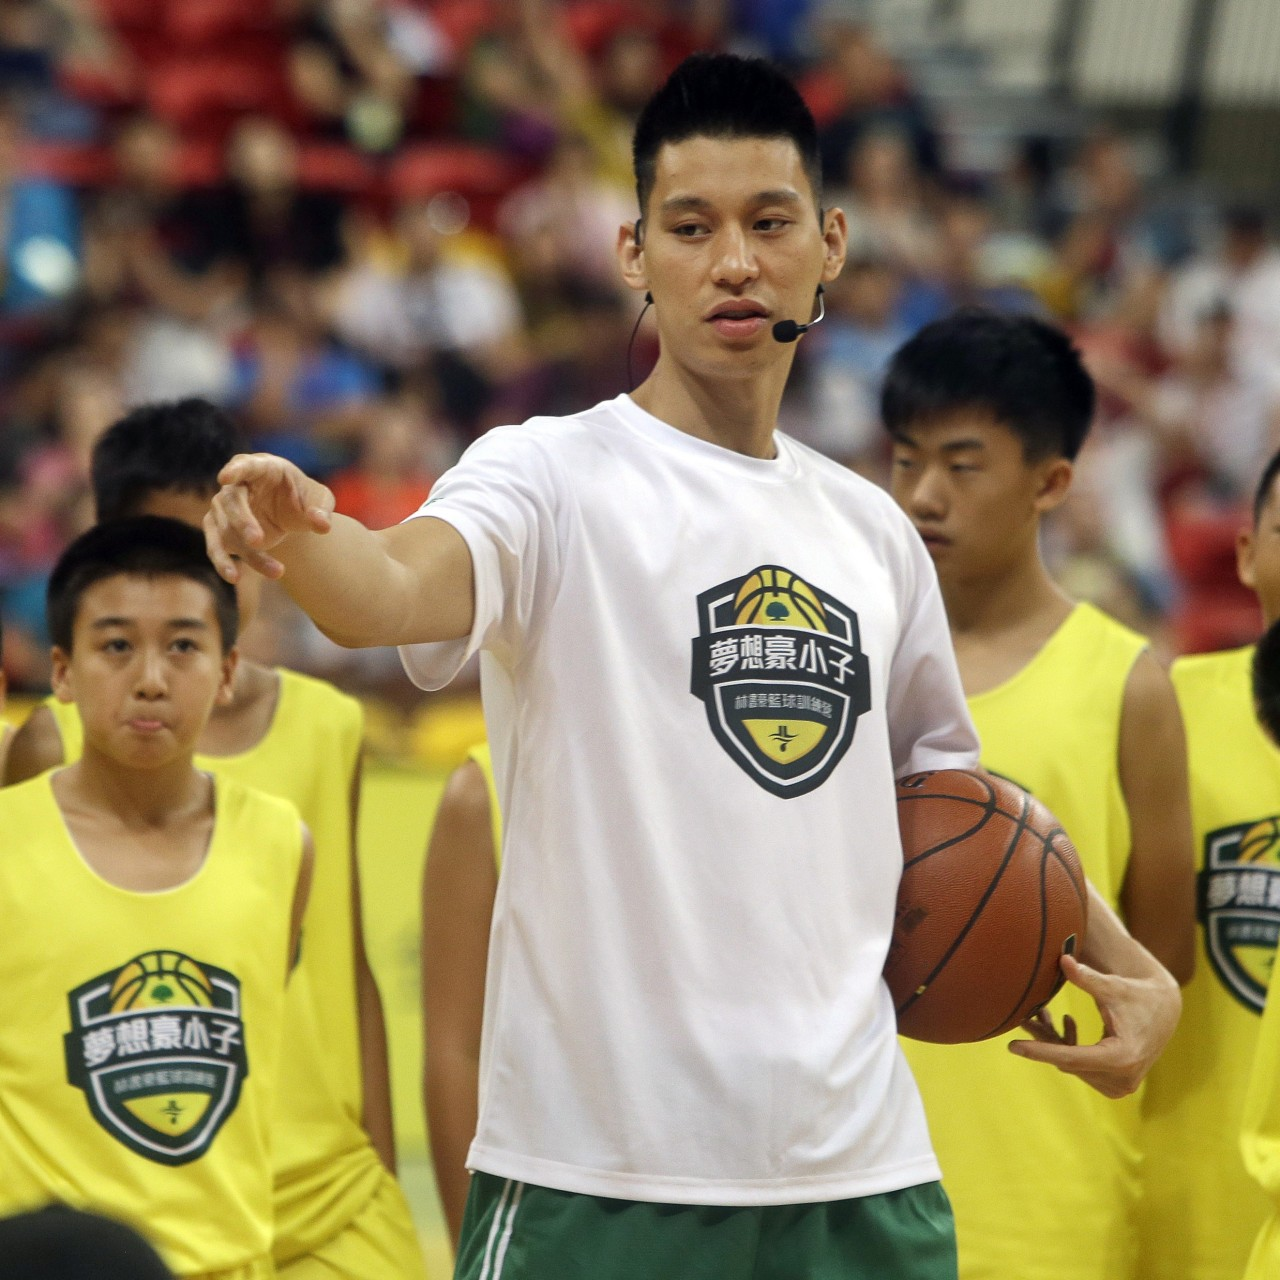 NBA champion Jeremy Lin at 'rock bottom' and he deserves sympathy